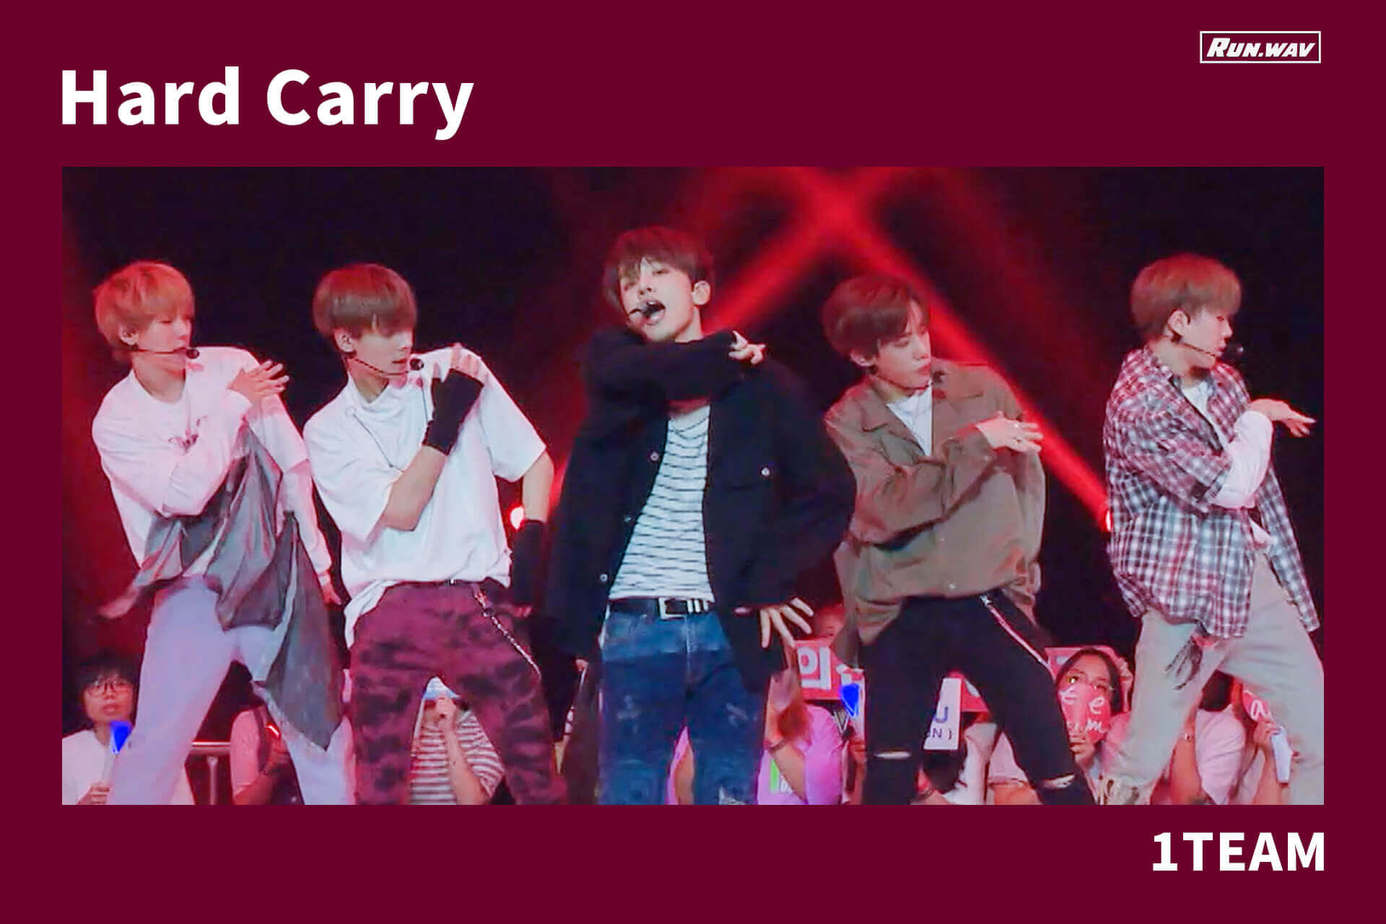 Hard Carry 1TEAM